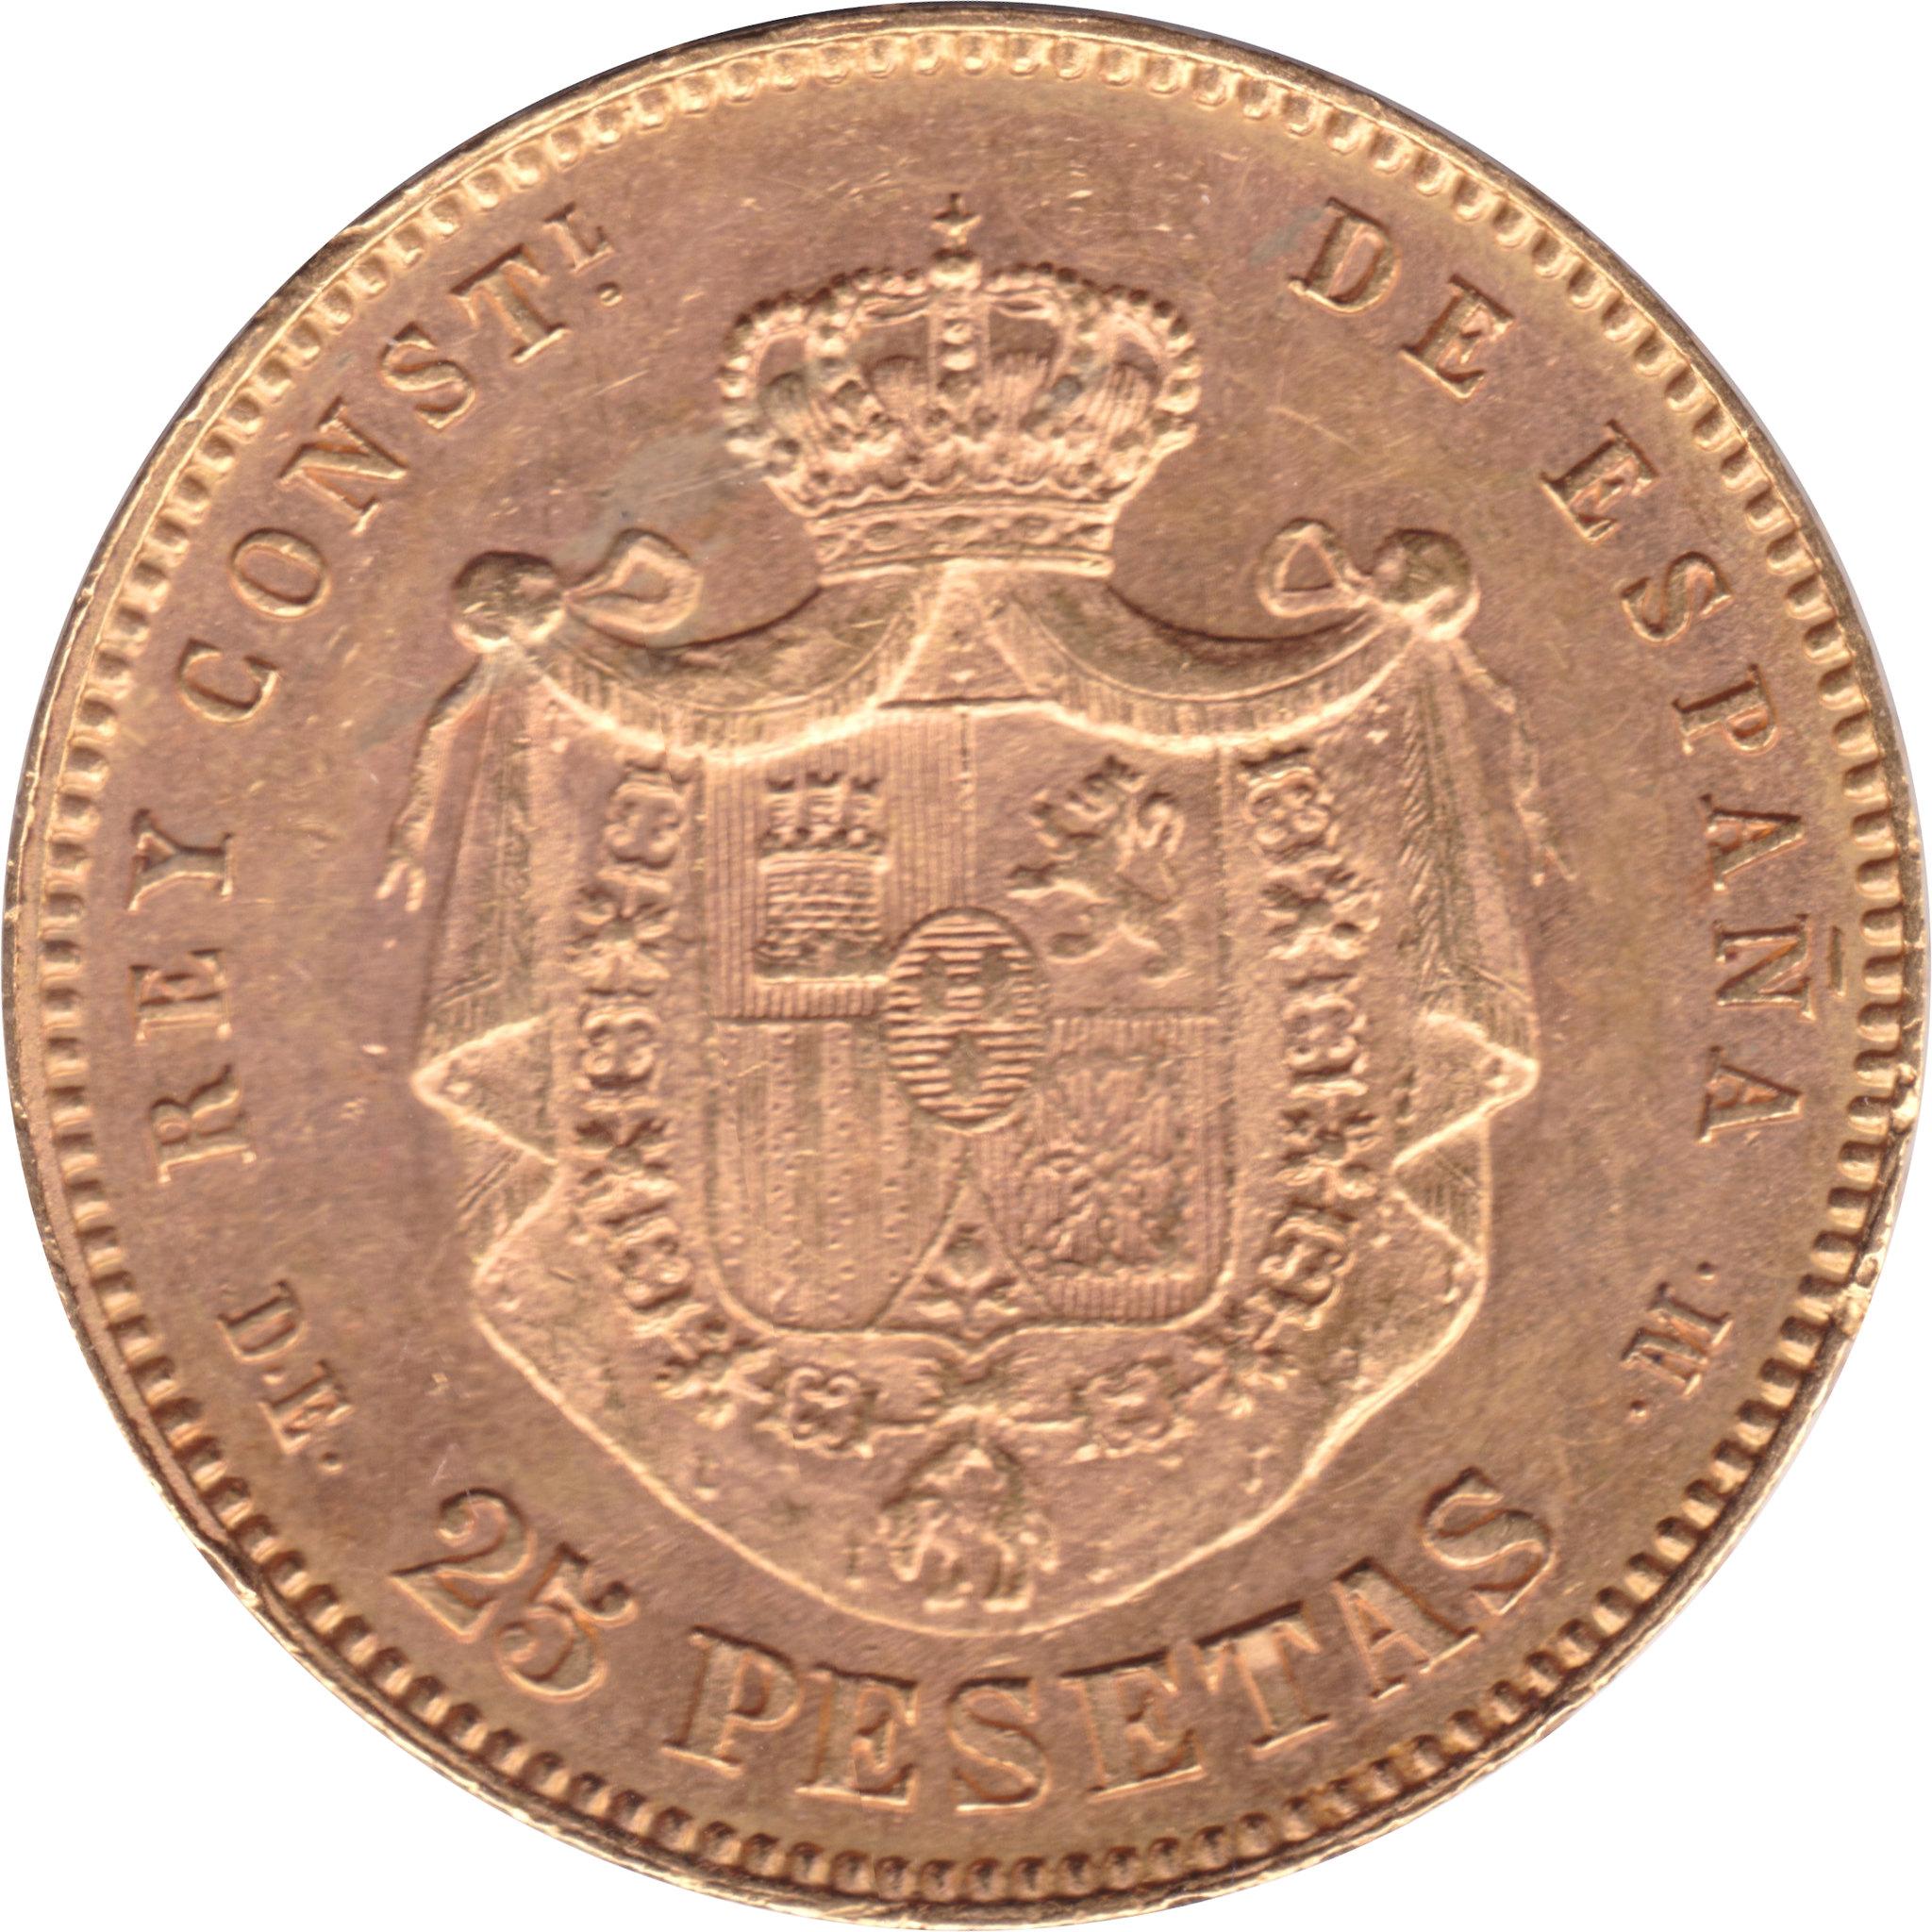 25 Pesetas 1877 *18 *77 Alfonso XII- DEM (subasta Cayon 24 abril)  8682392865_6403a60b69_k